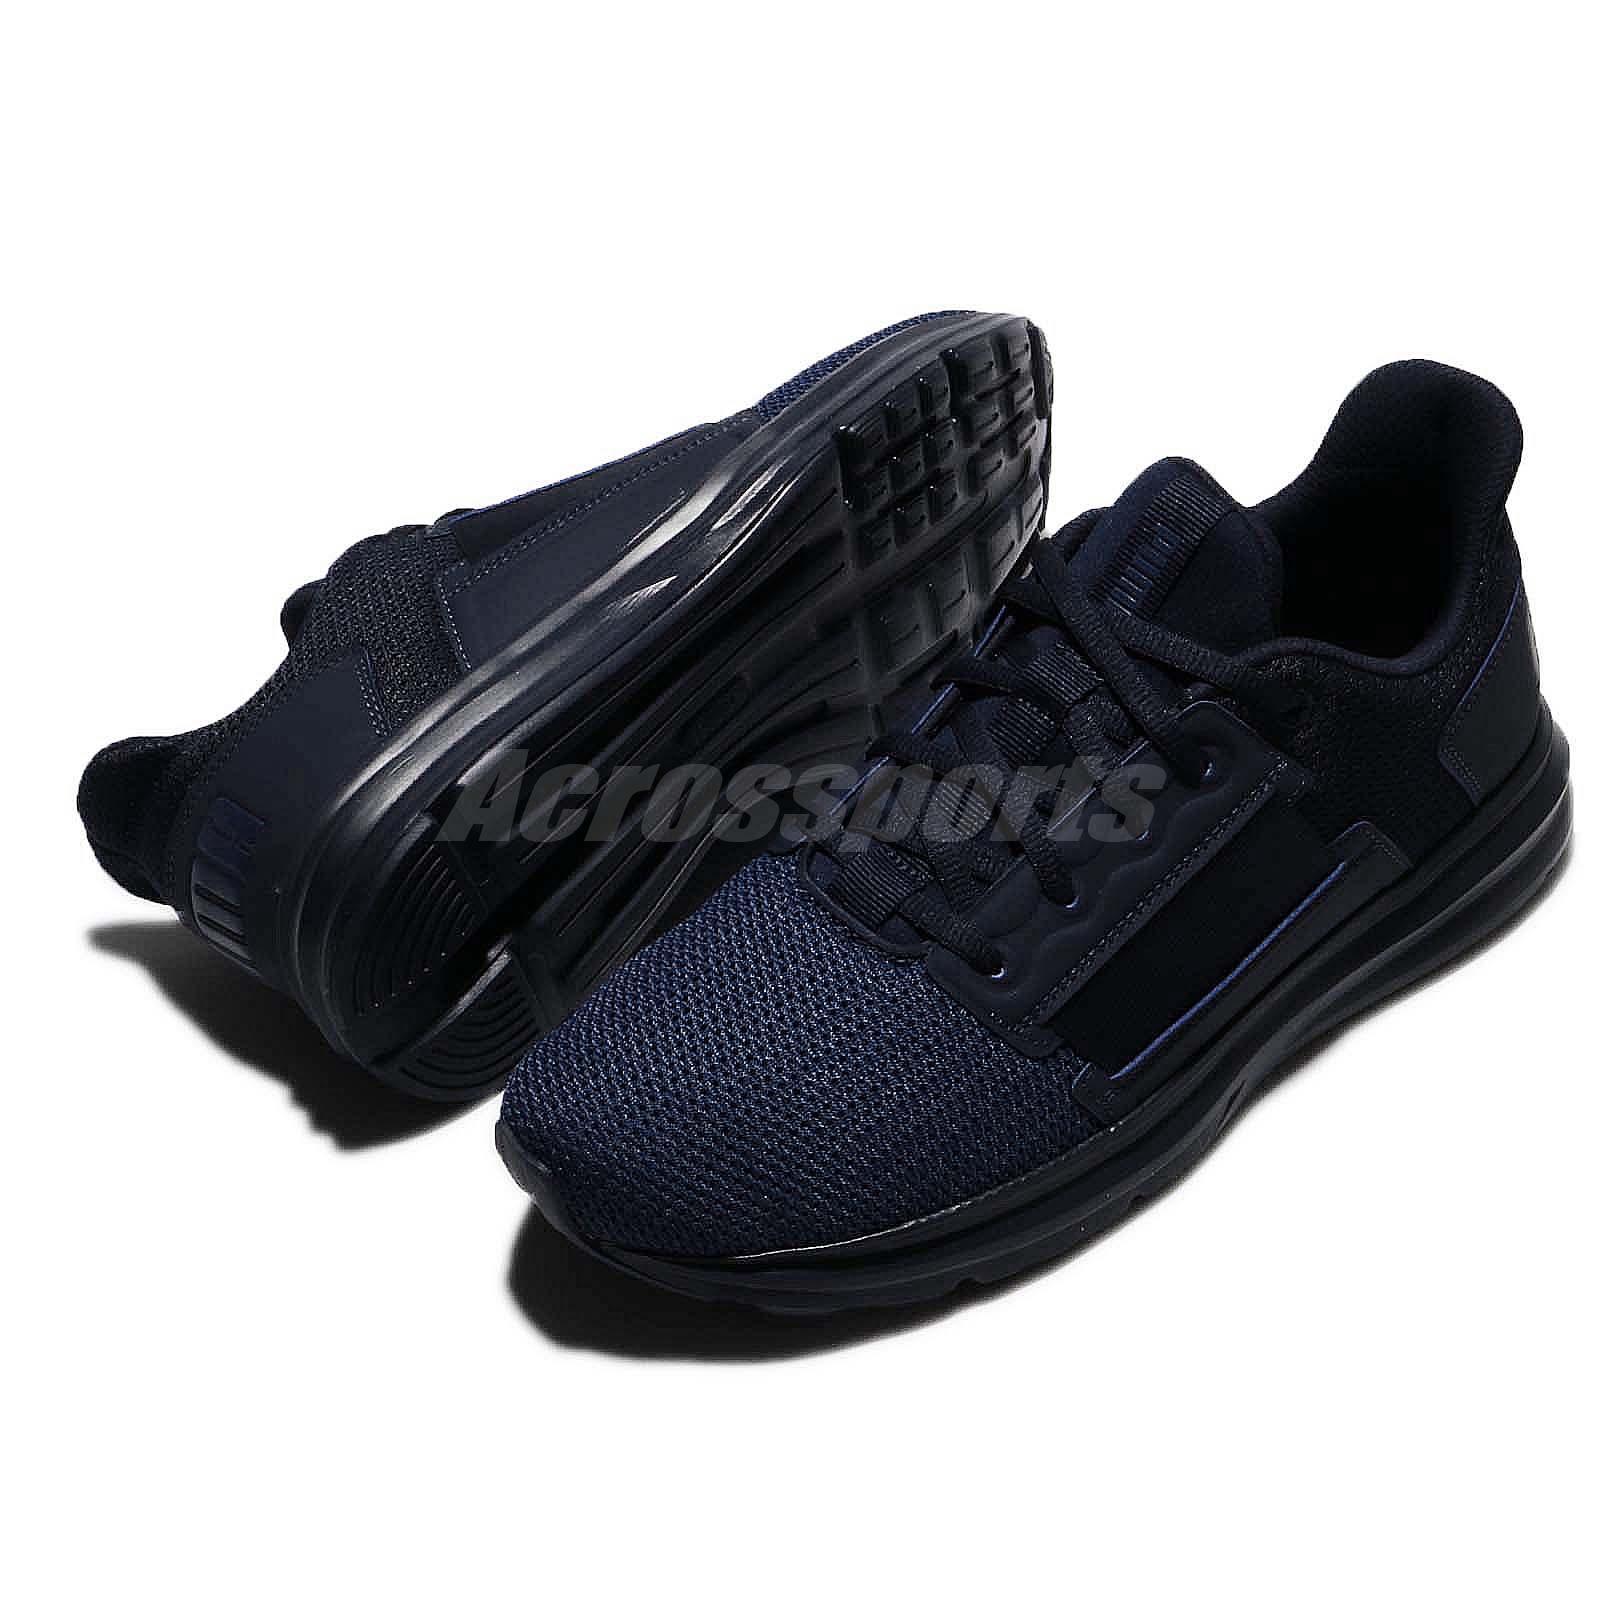 Ebay Puma Men Shoes